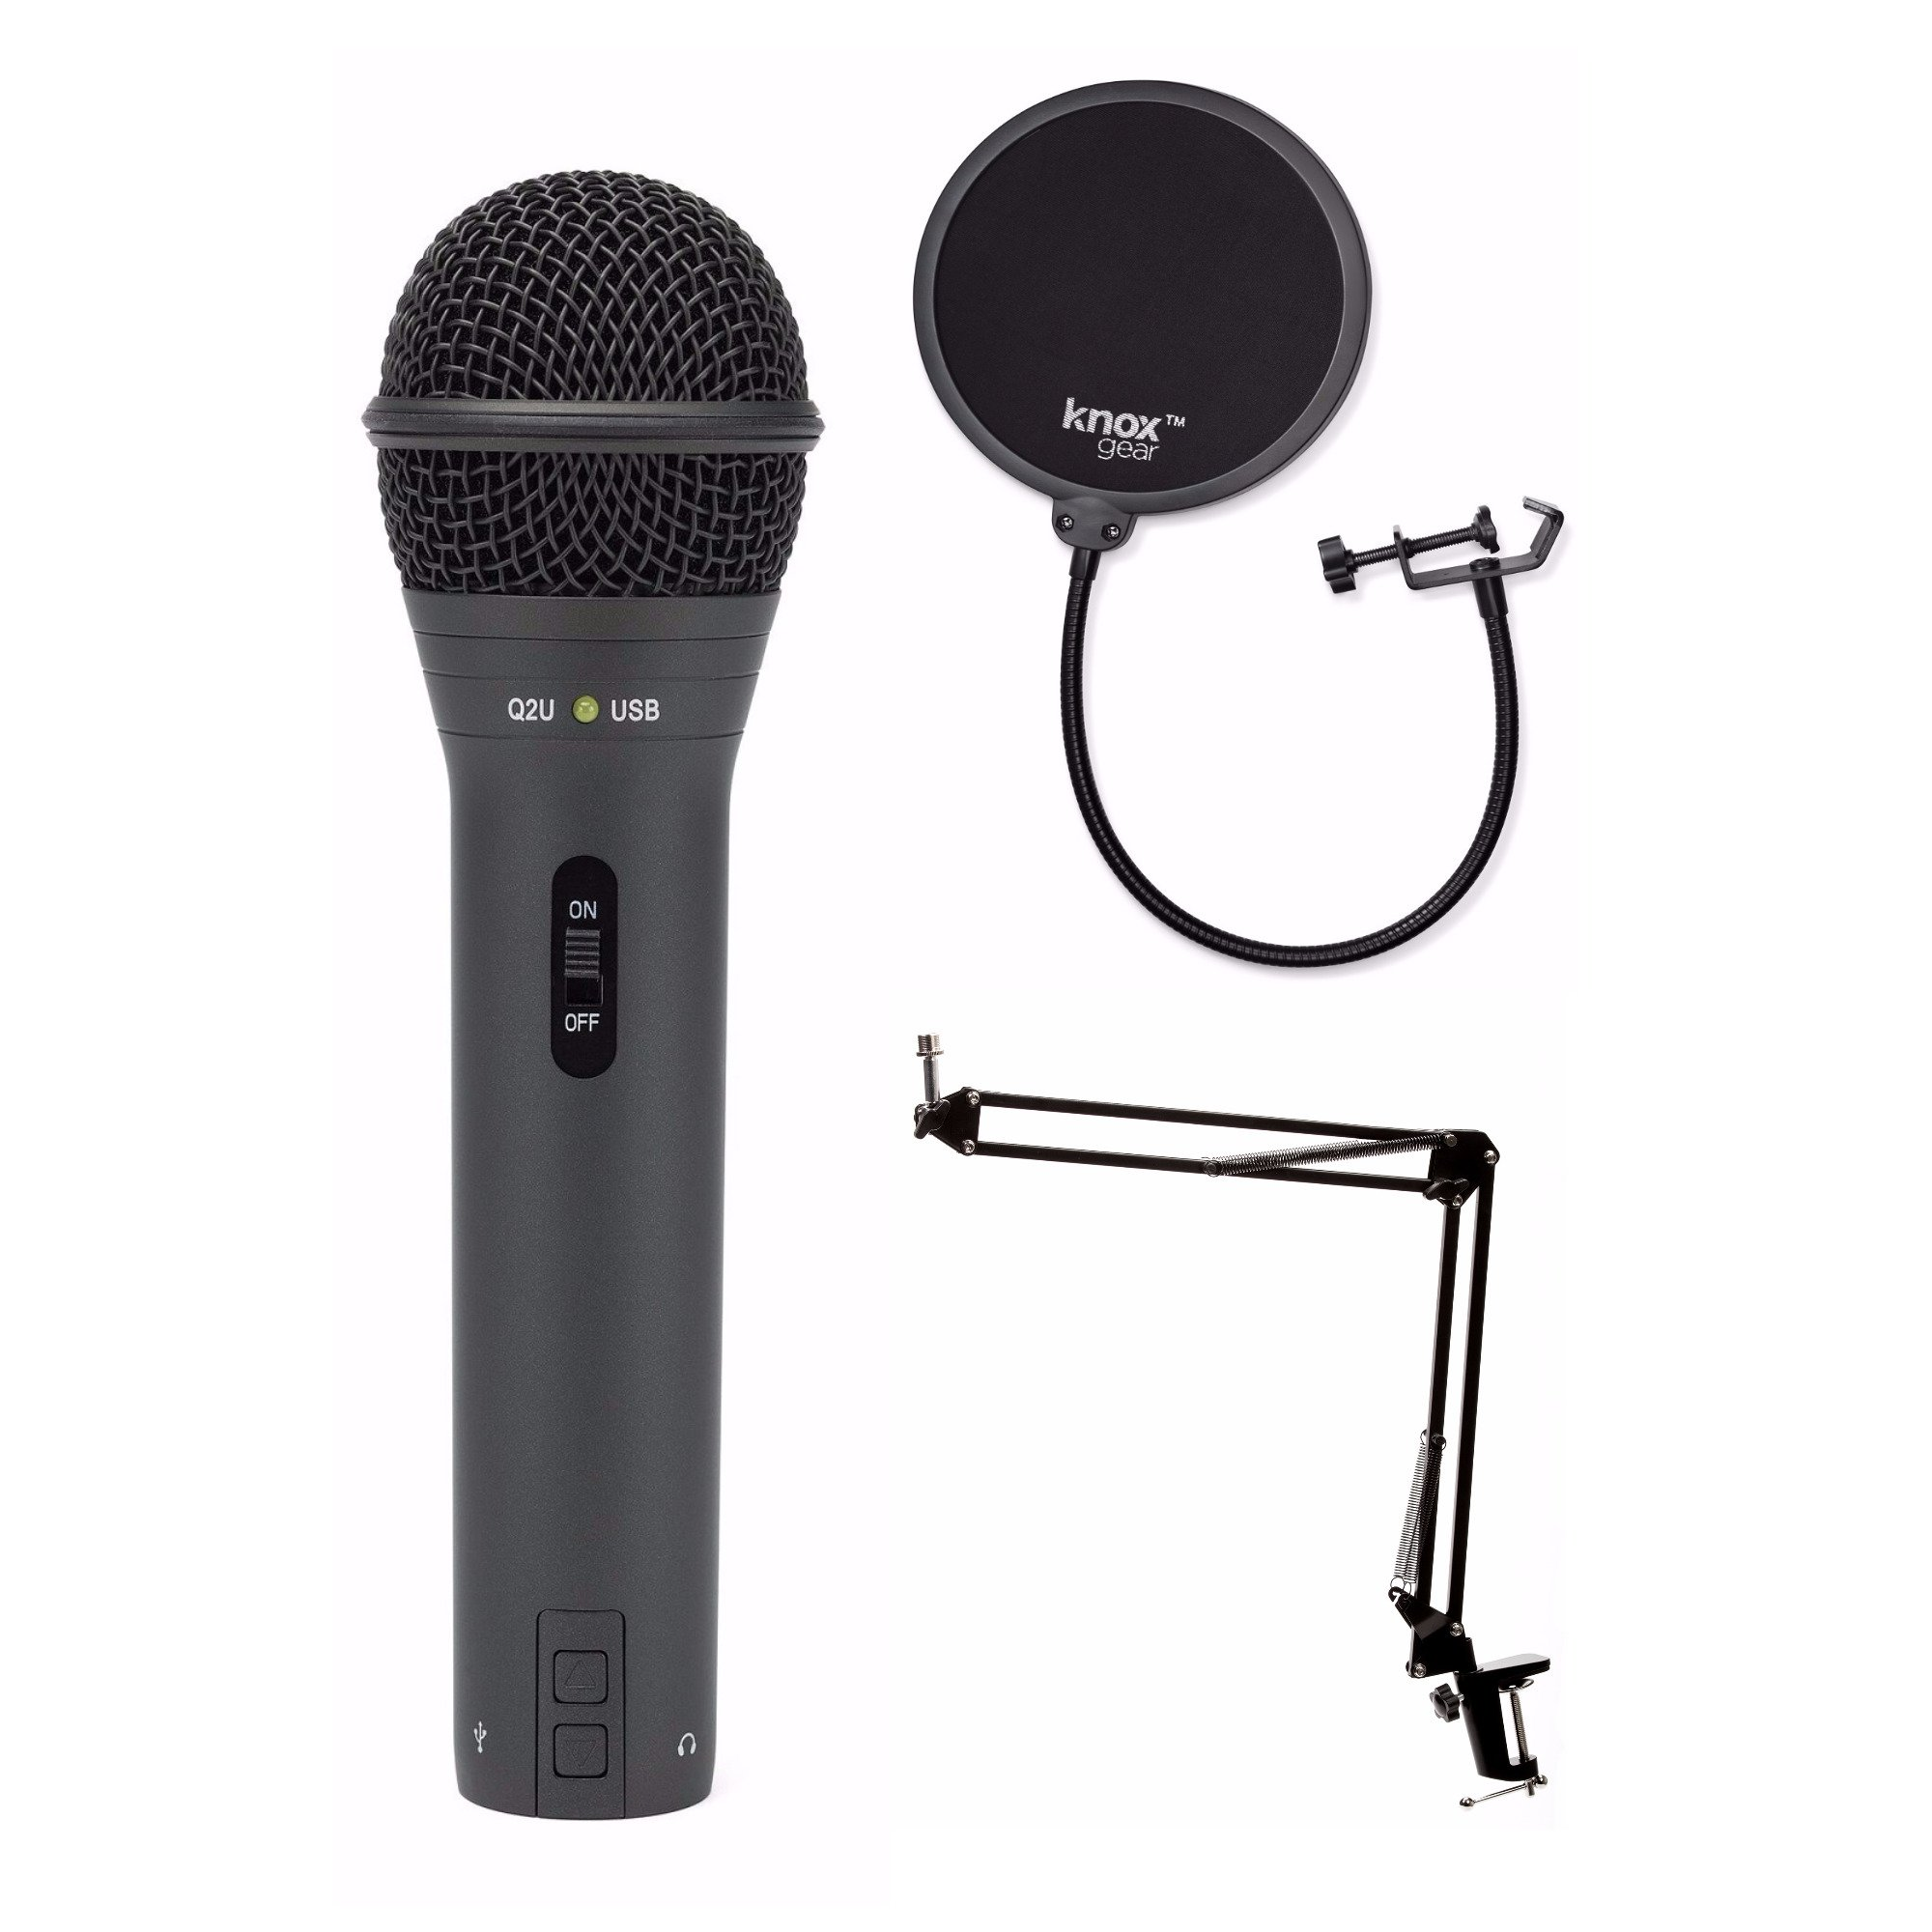 samson q2u black handheld dynamic usb microphone with knox boom arm and pop filter techadict. Black Bedroom Furniture Sets. Home Design Ideas